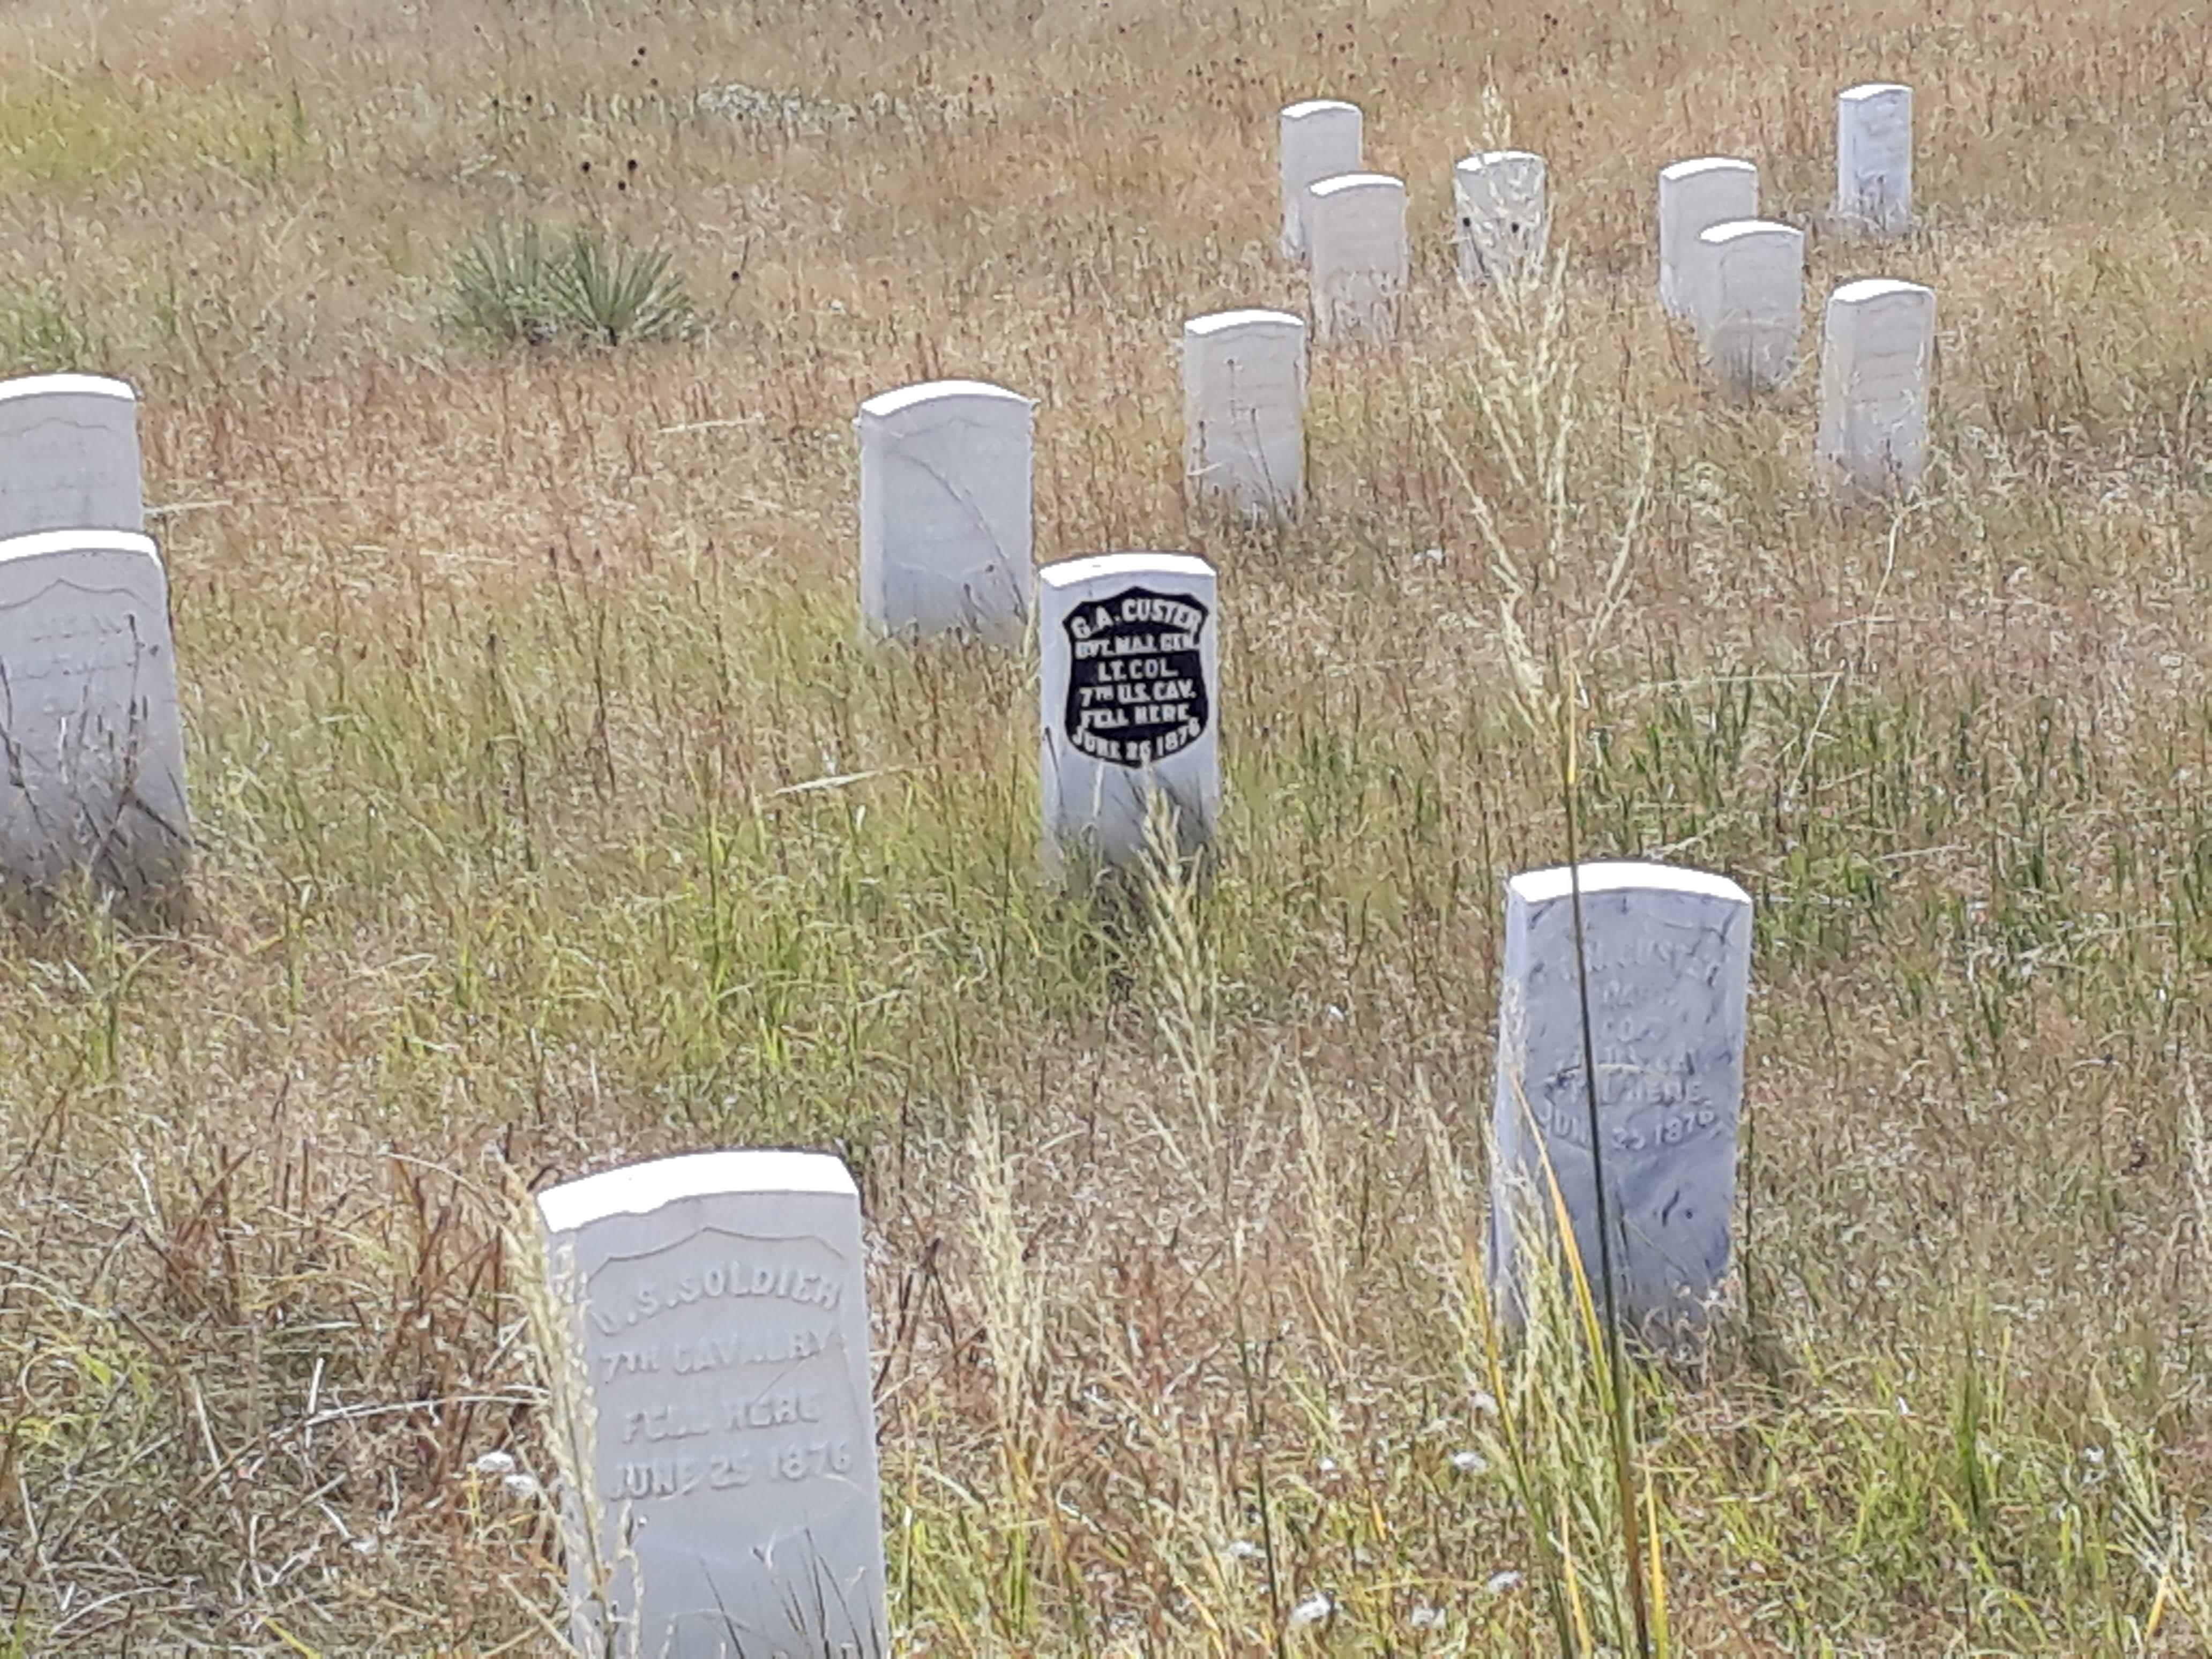 Little Bighorn Battlefield - Marker Stones